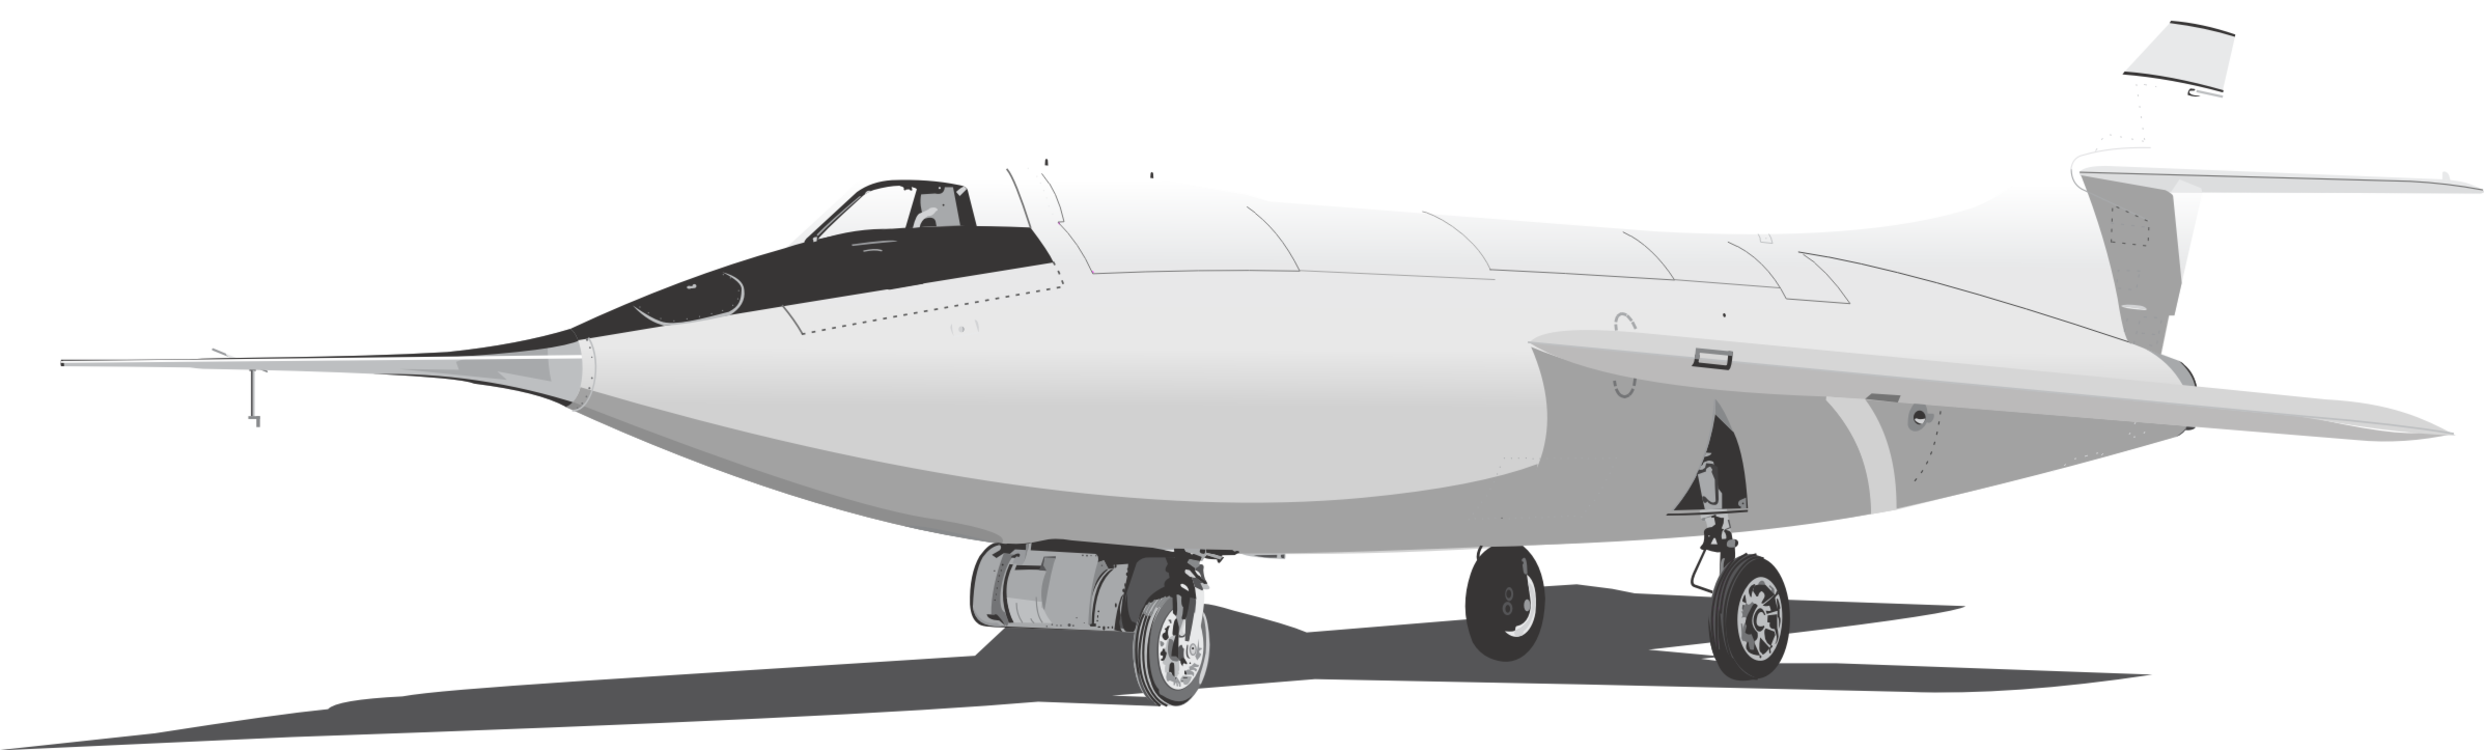 Flap,Jet Aircraft,Naval Architecture